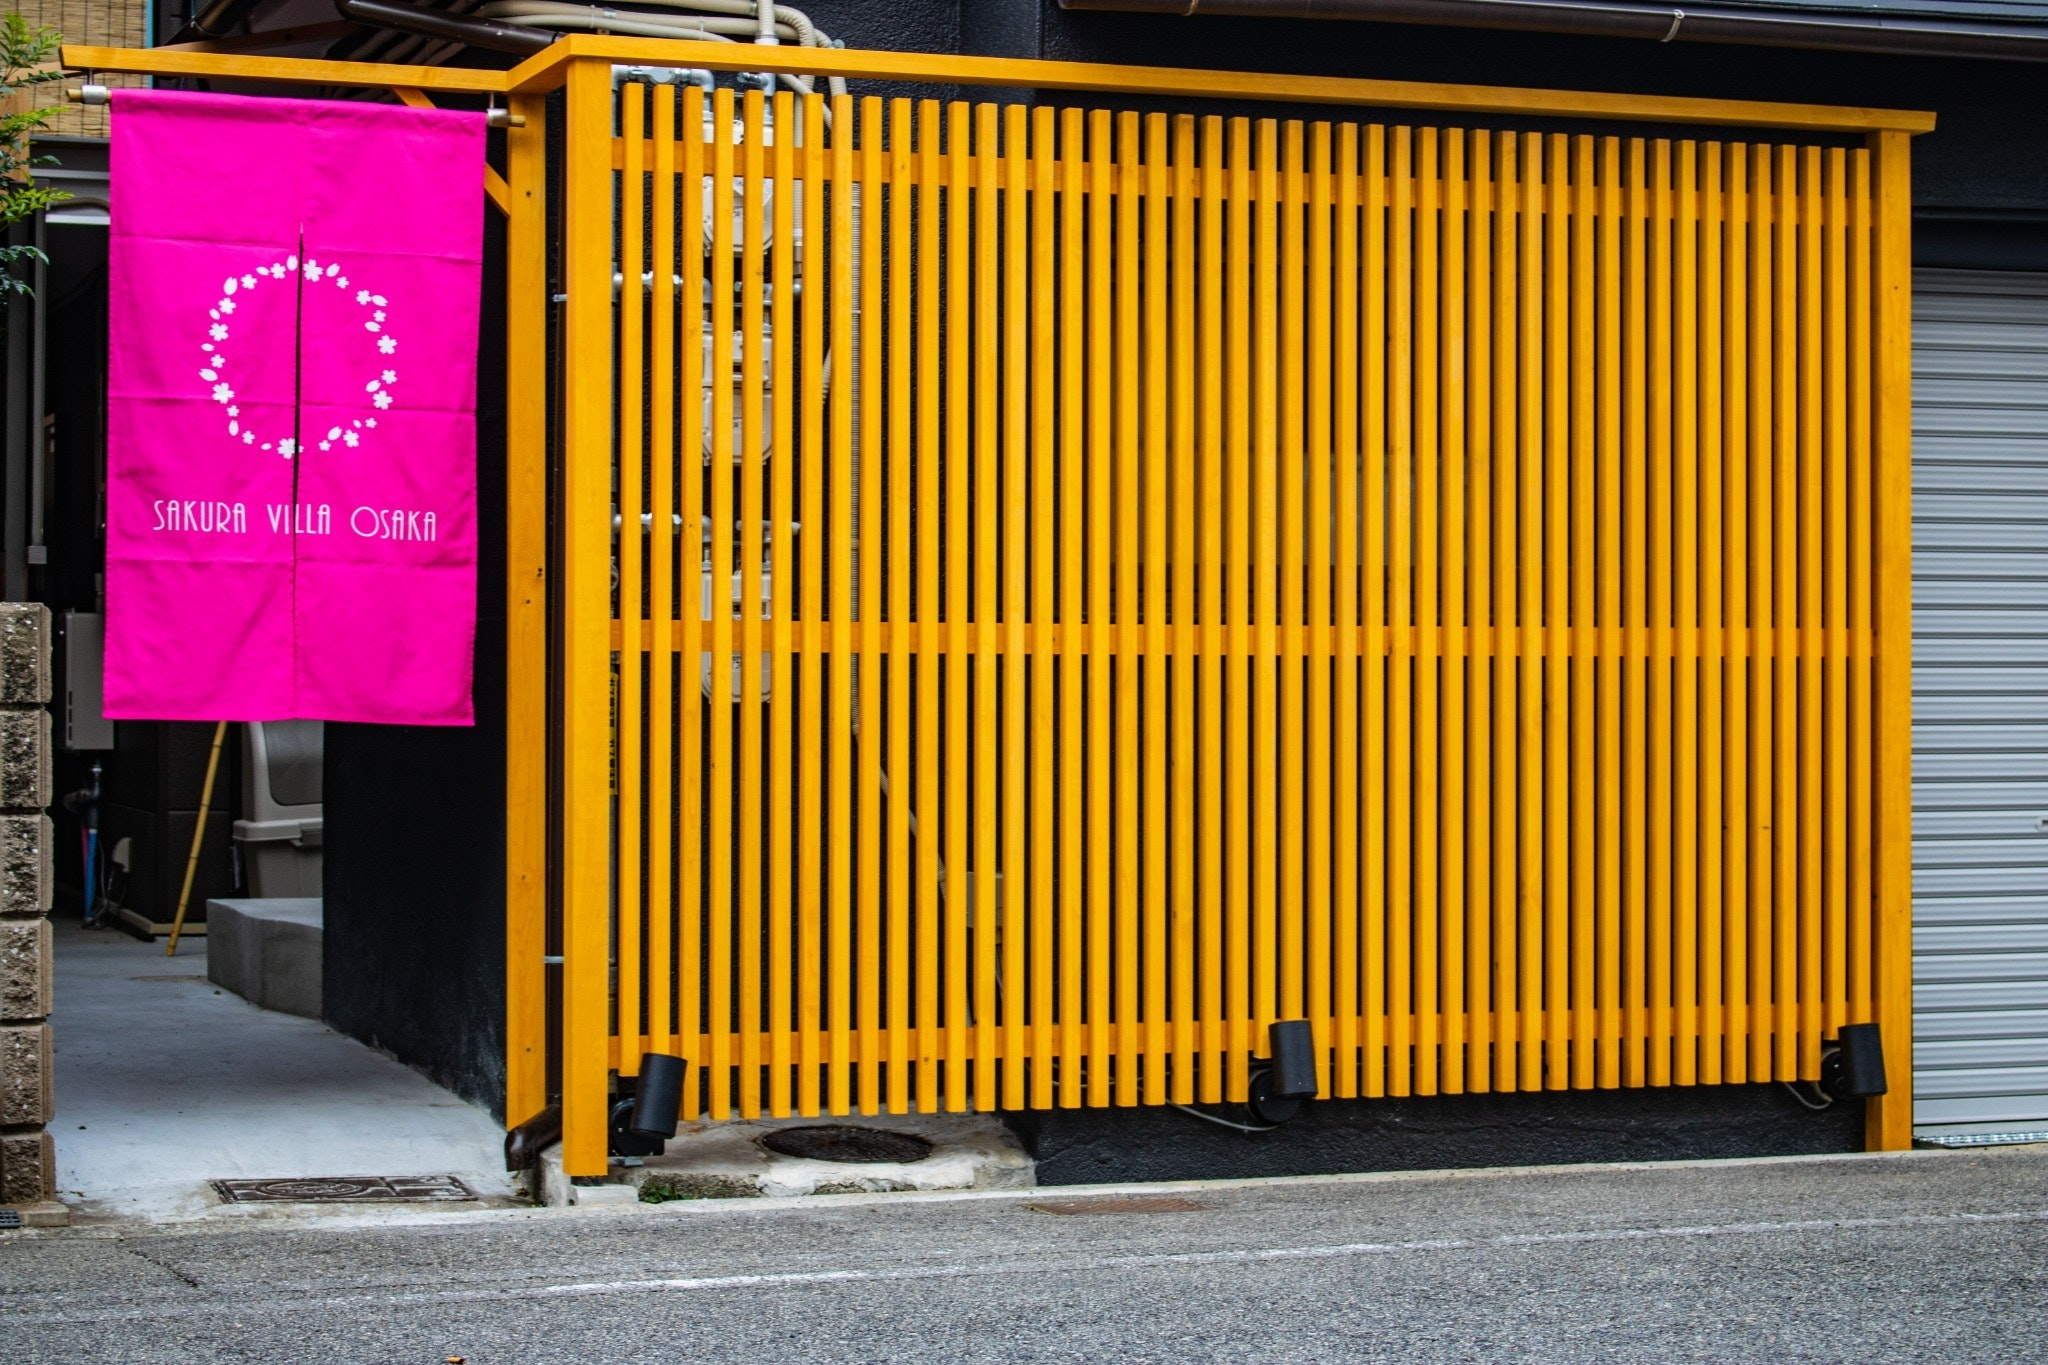 USJまで2駅 ティファニーブルーのかわいいお部屋 in Sakura Villa